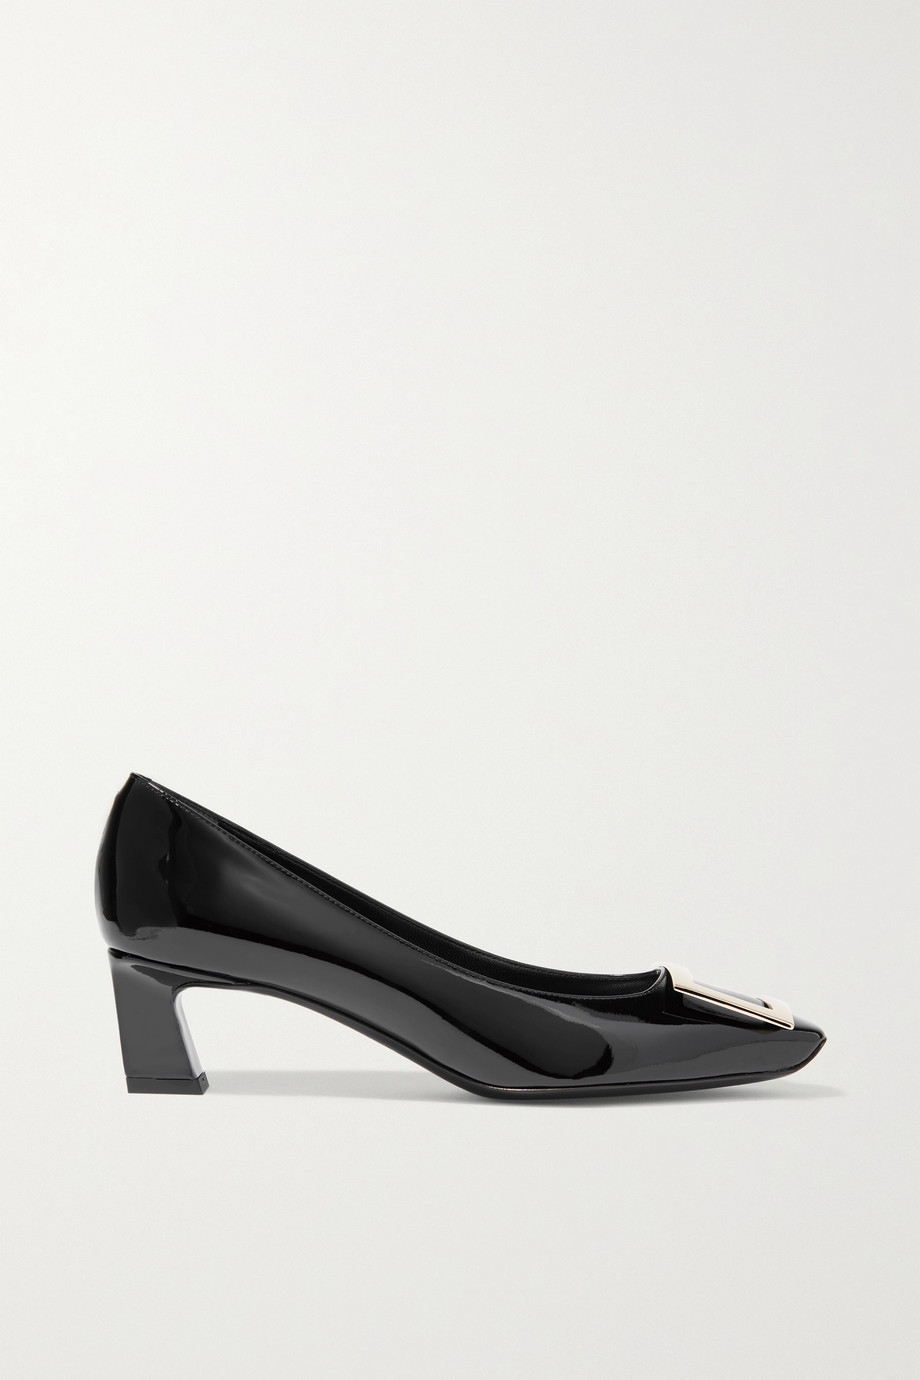 Roger Vivier Decollete Trompette 漆皮中跟鞋